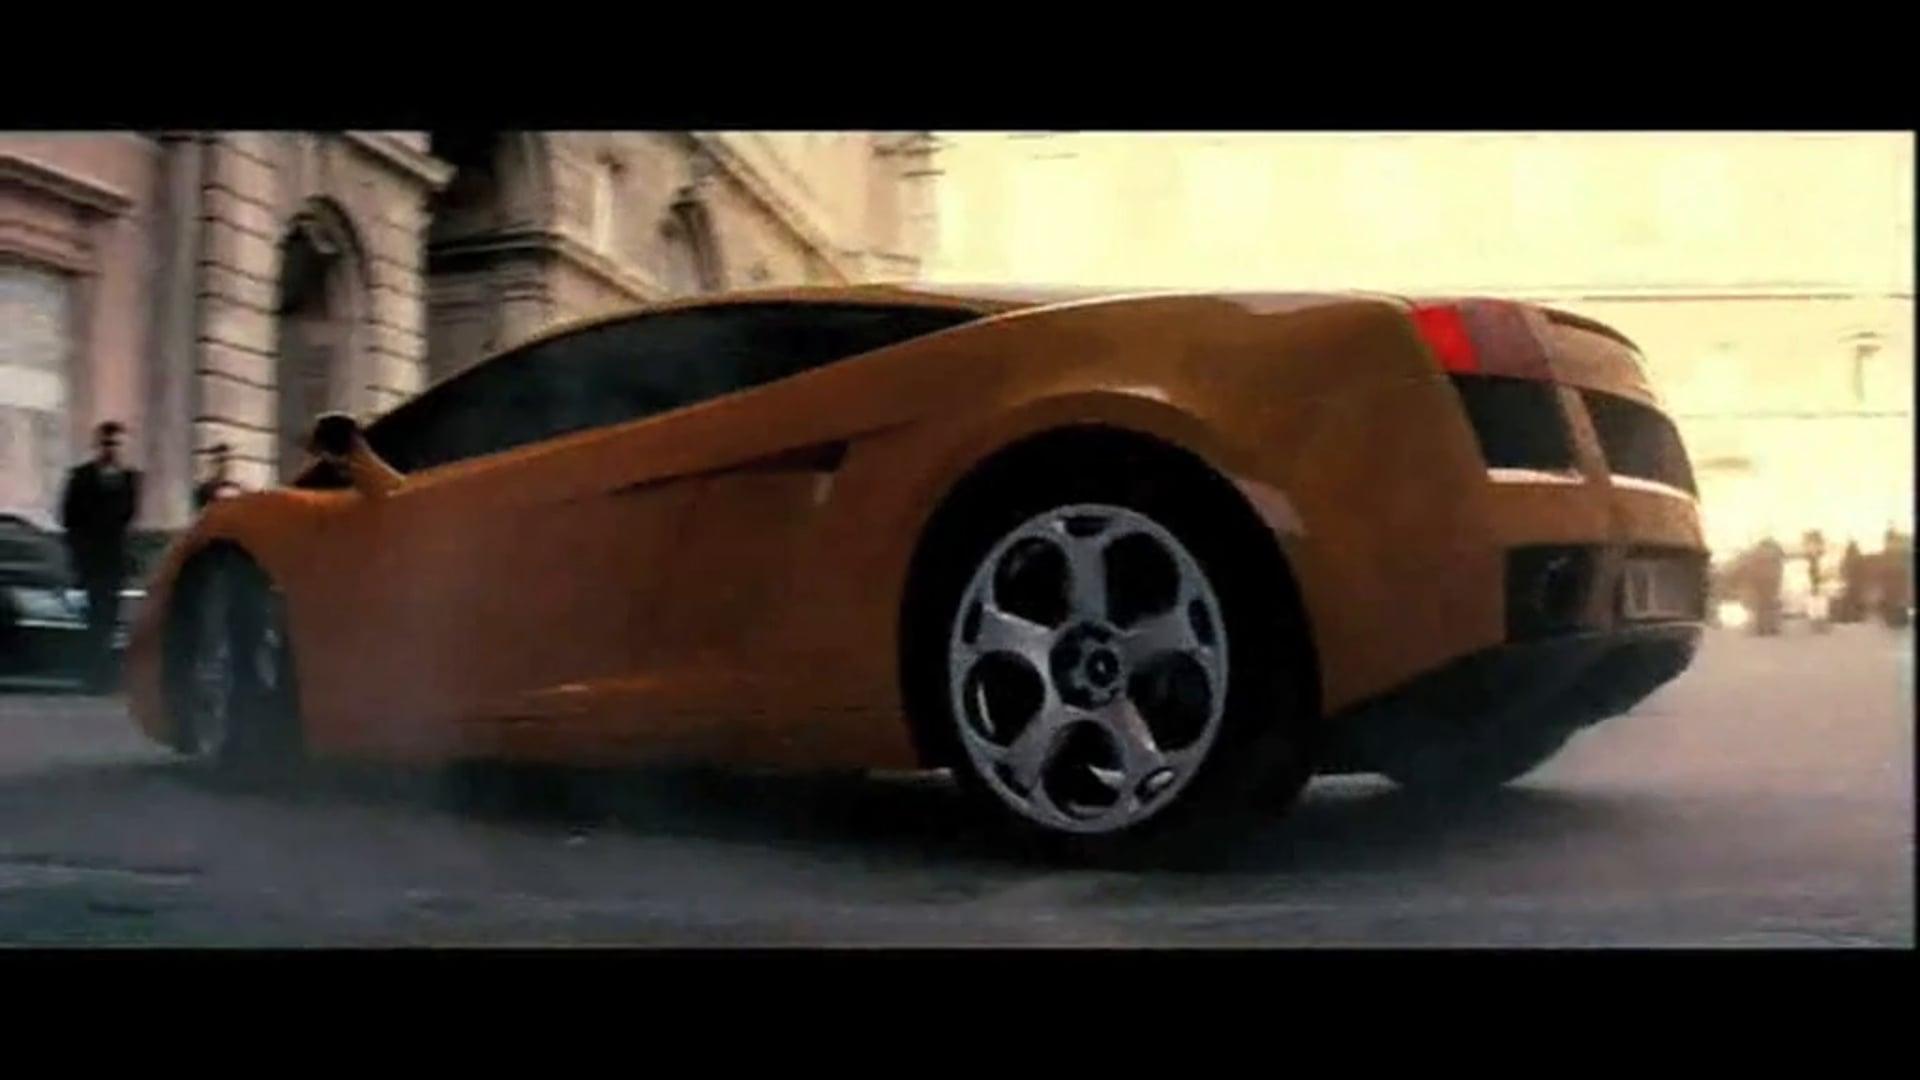 Reel 2015 Daniele Farai - DF5 Video Editing